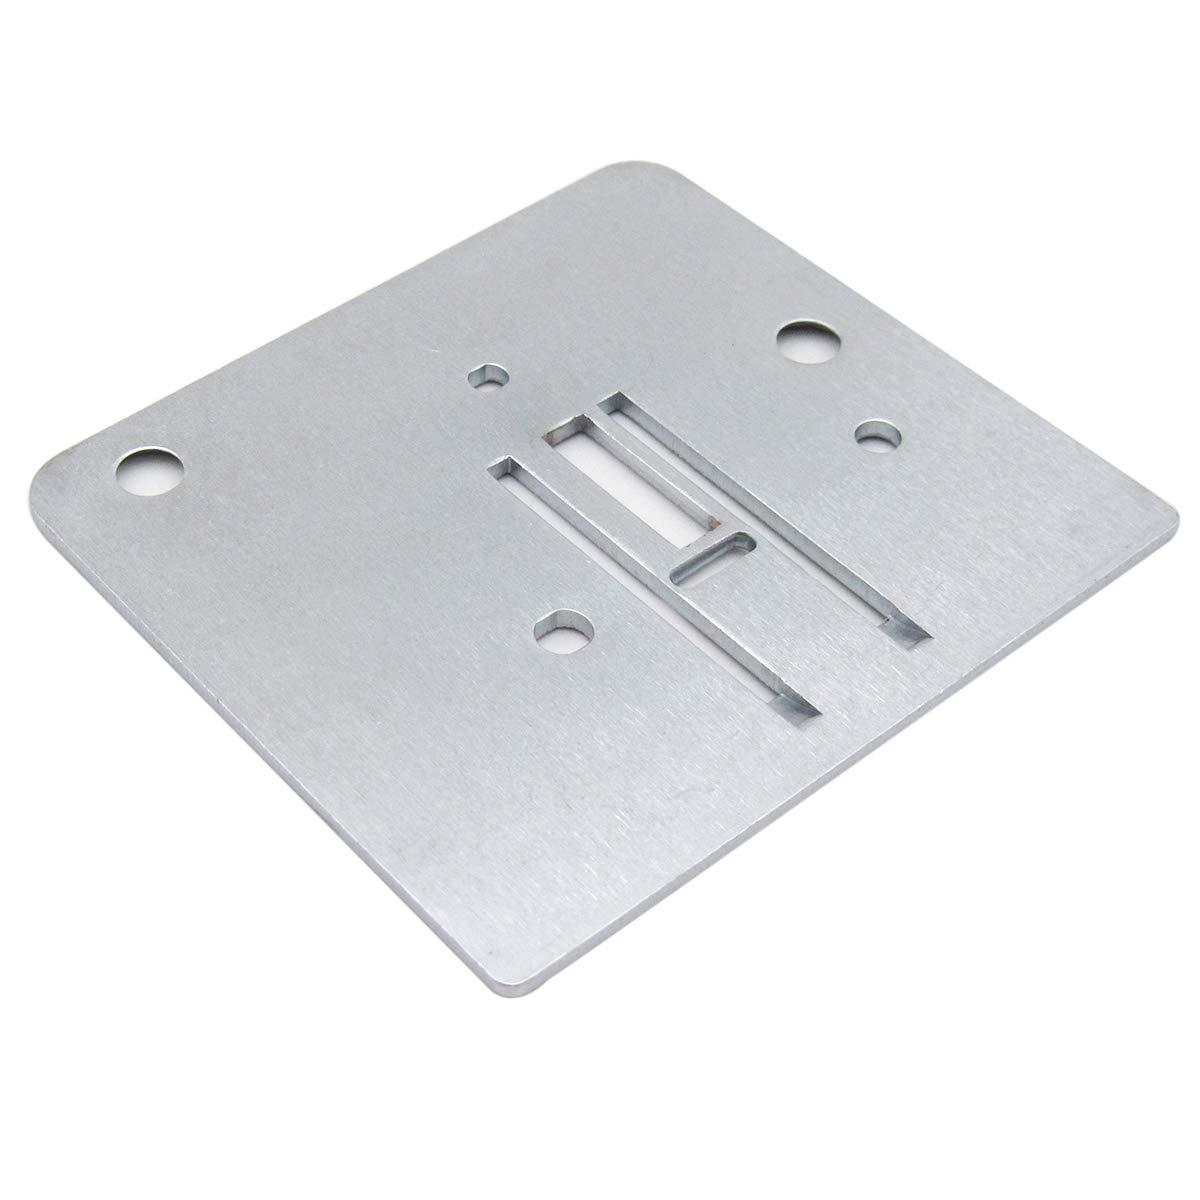 KUNPENG -1 piezas # 744004001 o 98-739008-00 Placa de agujas PARA ...